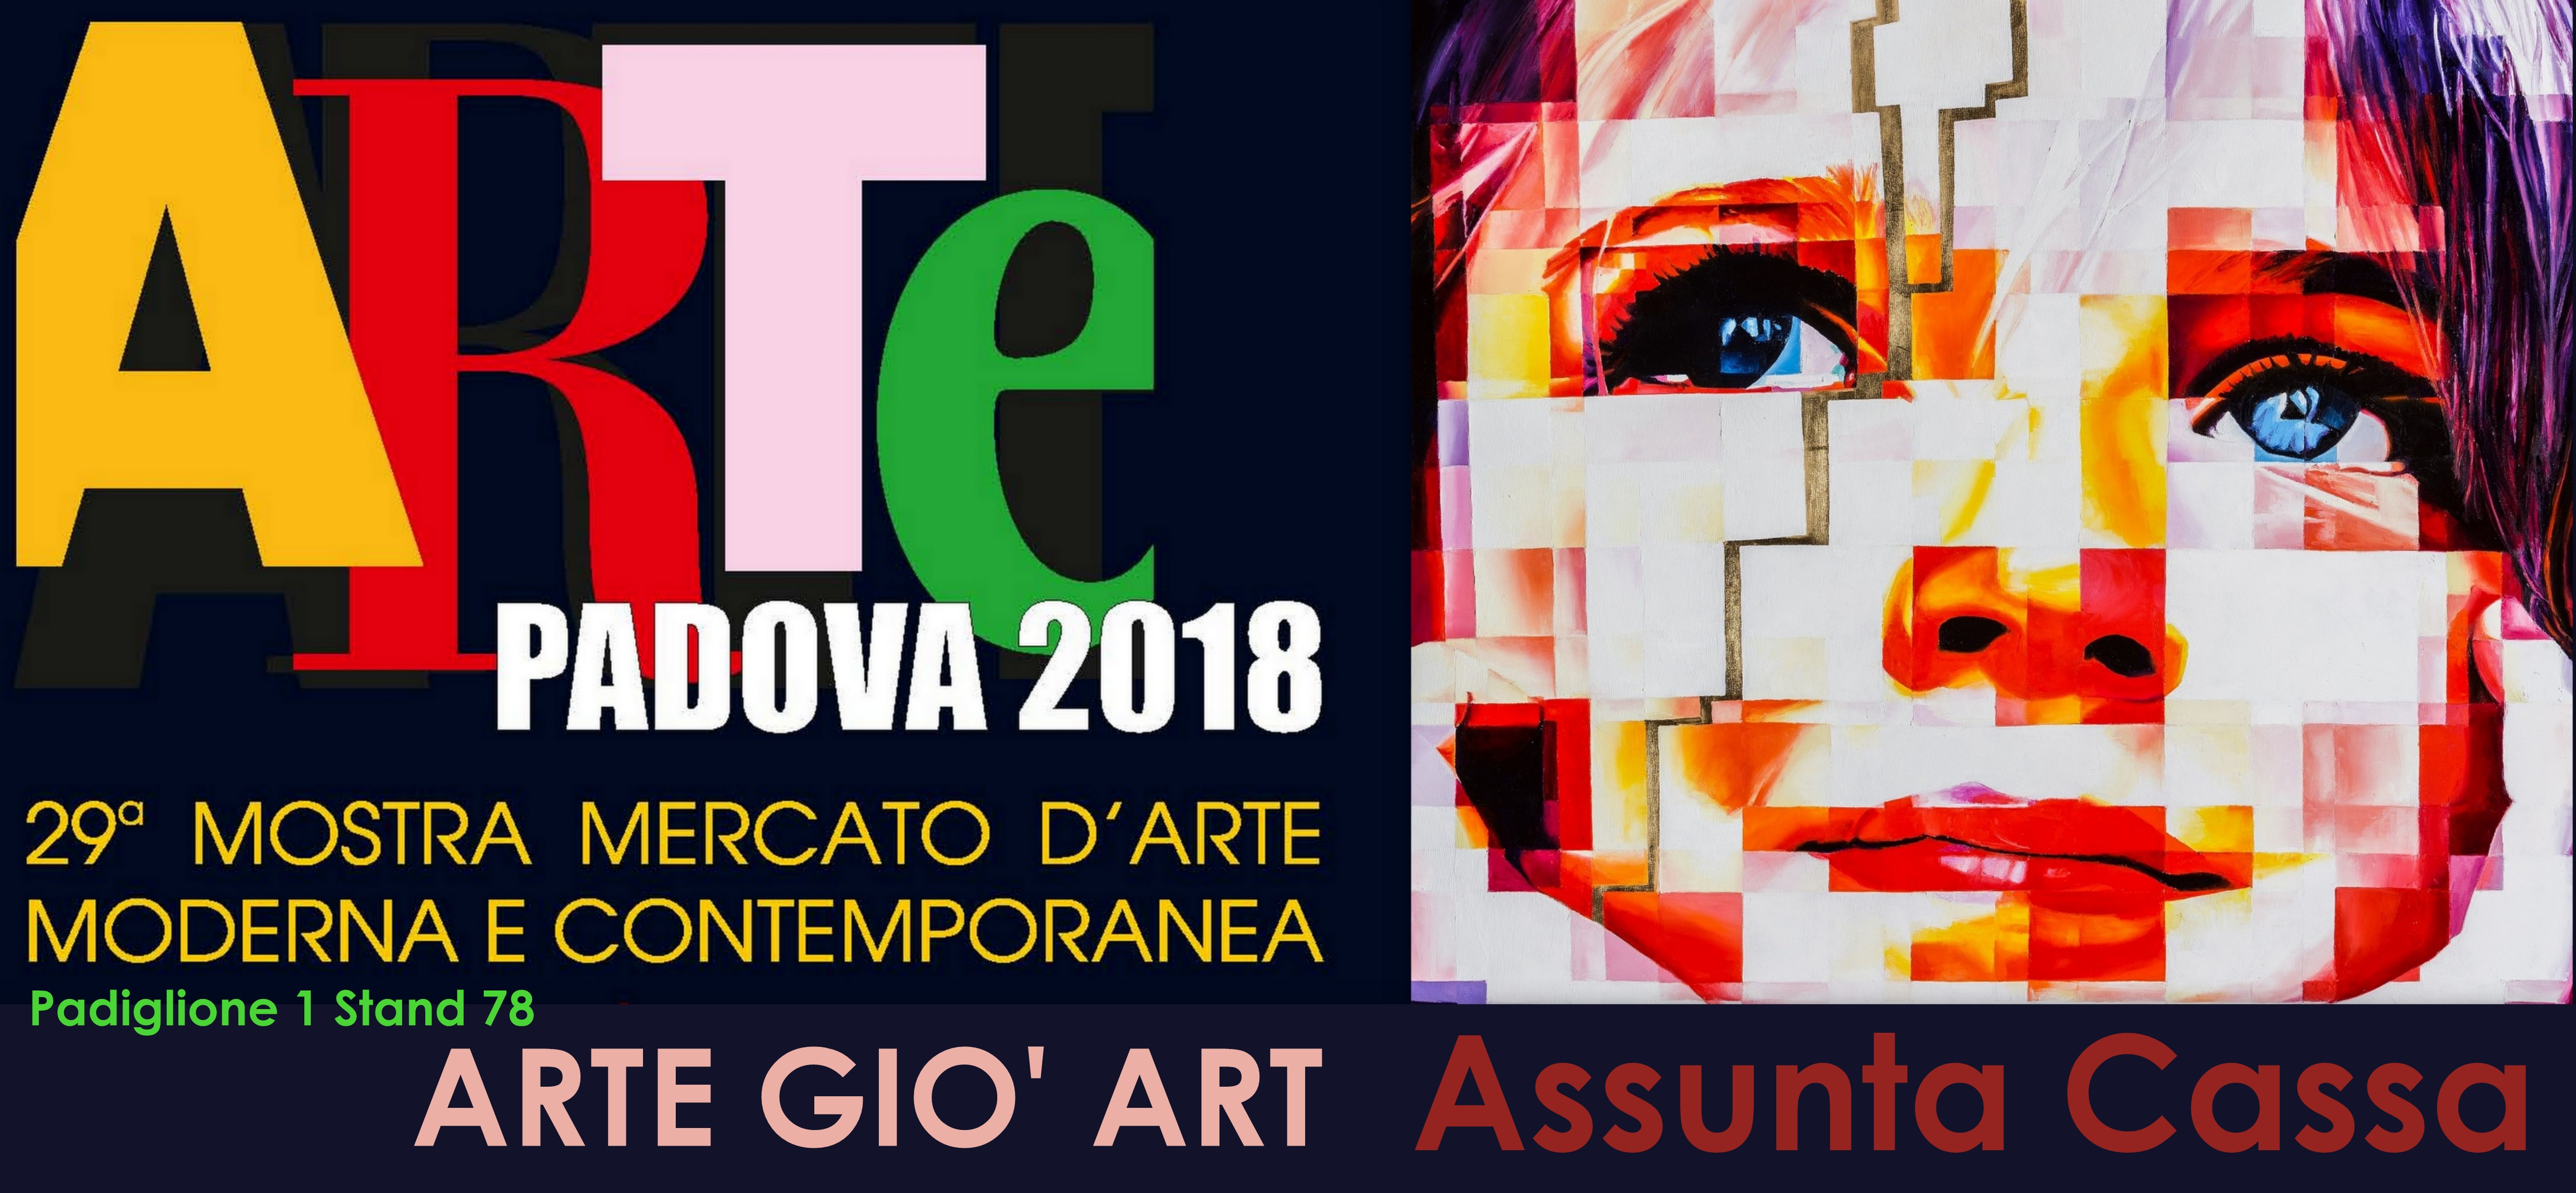 ArtePadova 2018